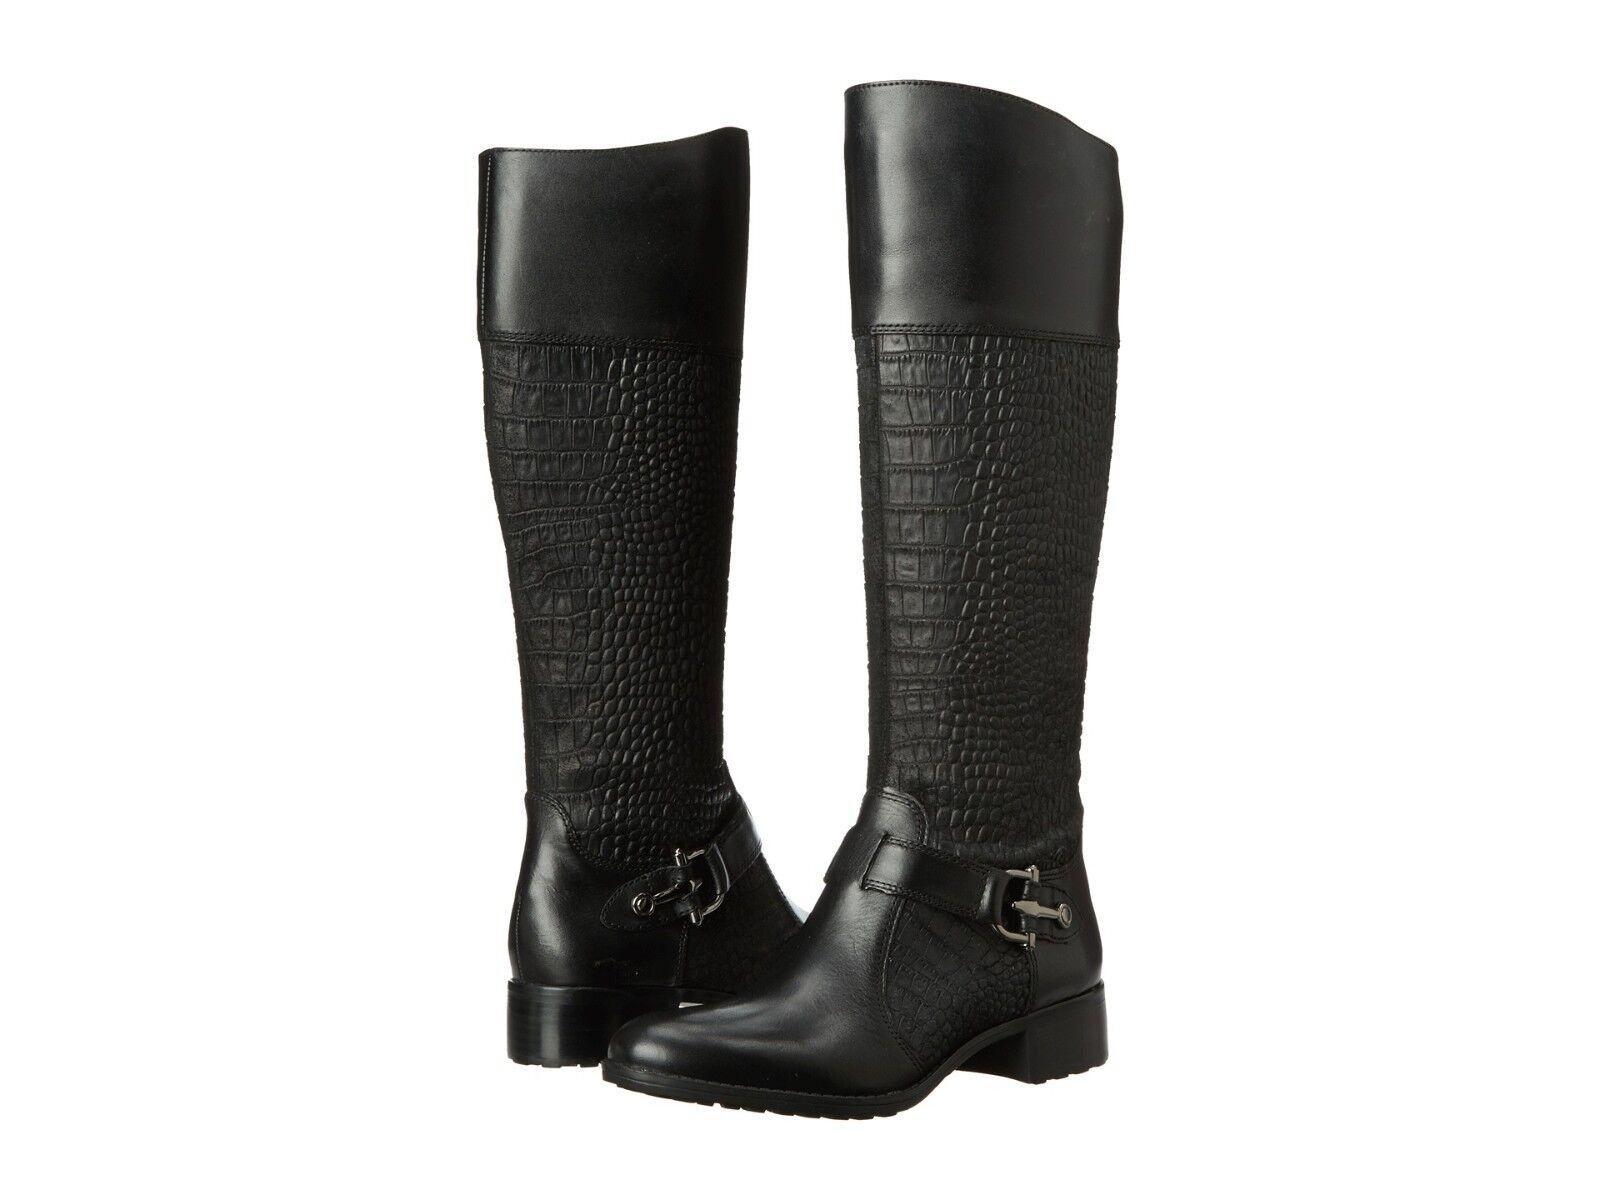 Circa Joan & David Womens Takara Black Pull On Zipper Knee-High Fashion Boots